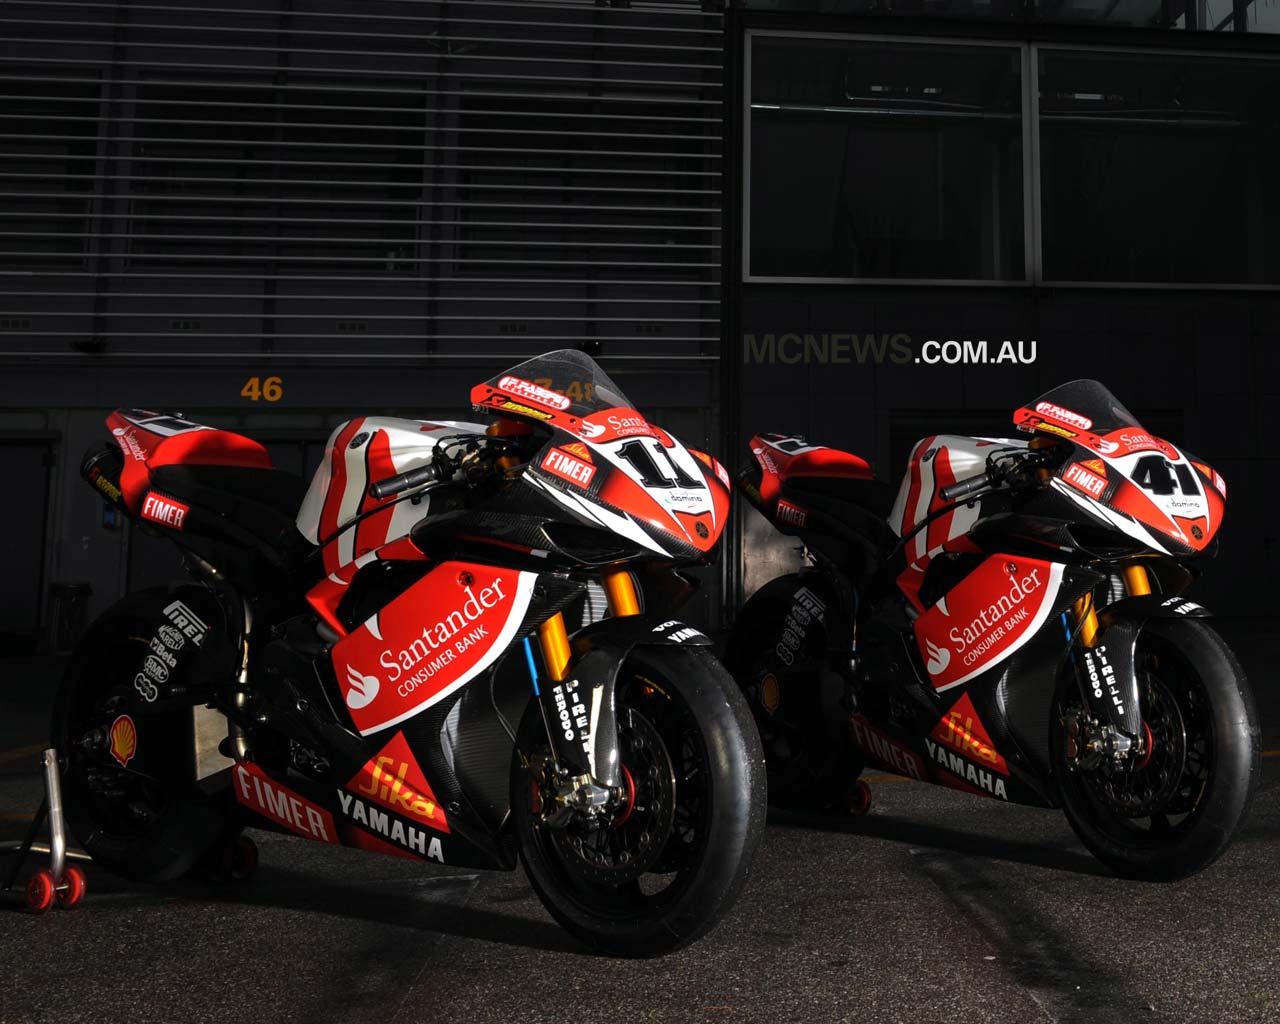 Yamaha r1 superbike wallpapers super heavy bikes - Superbike wallpaper ...